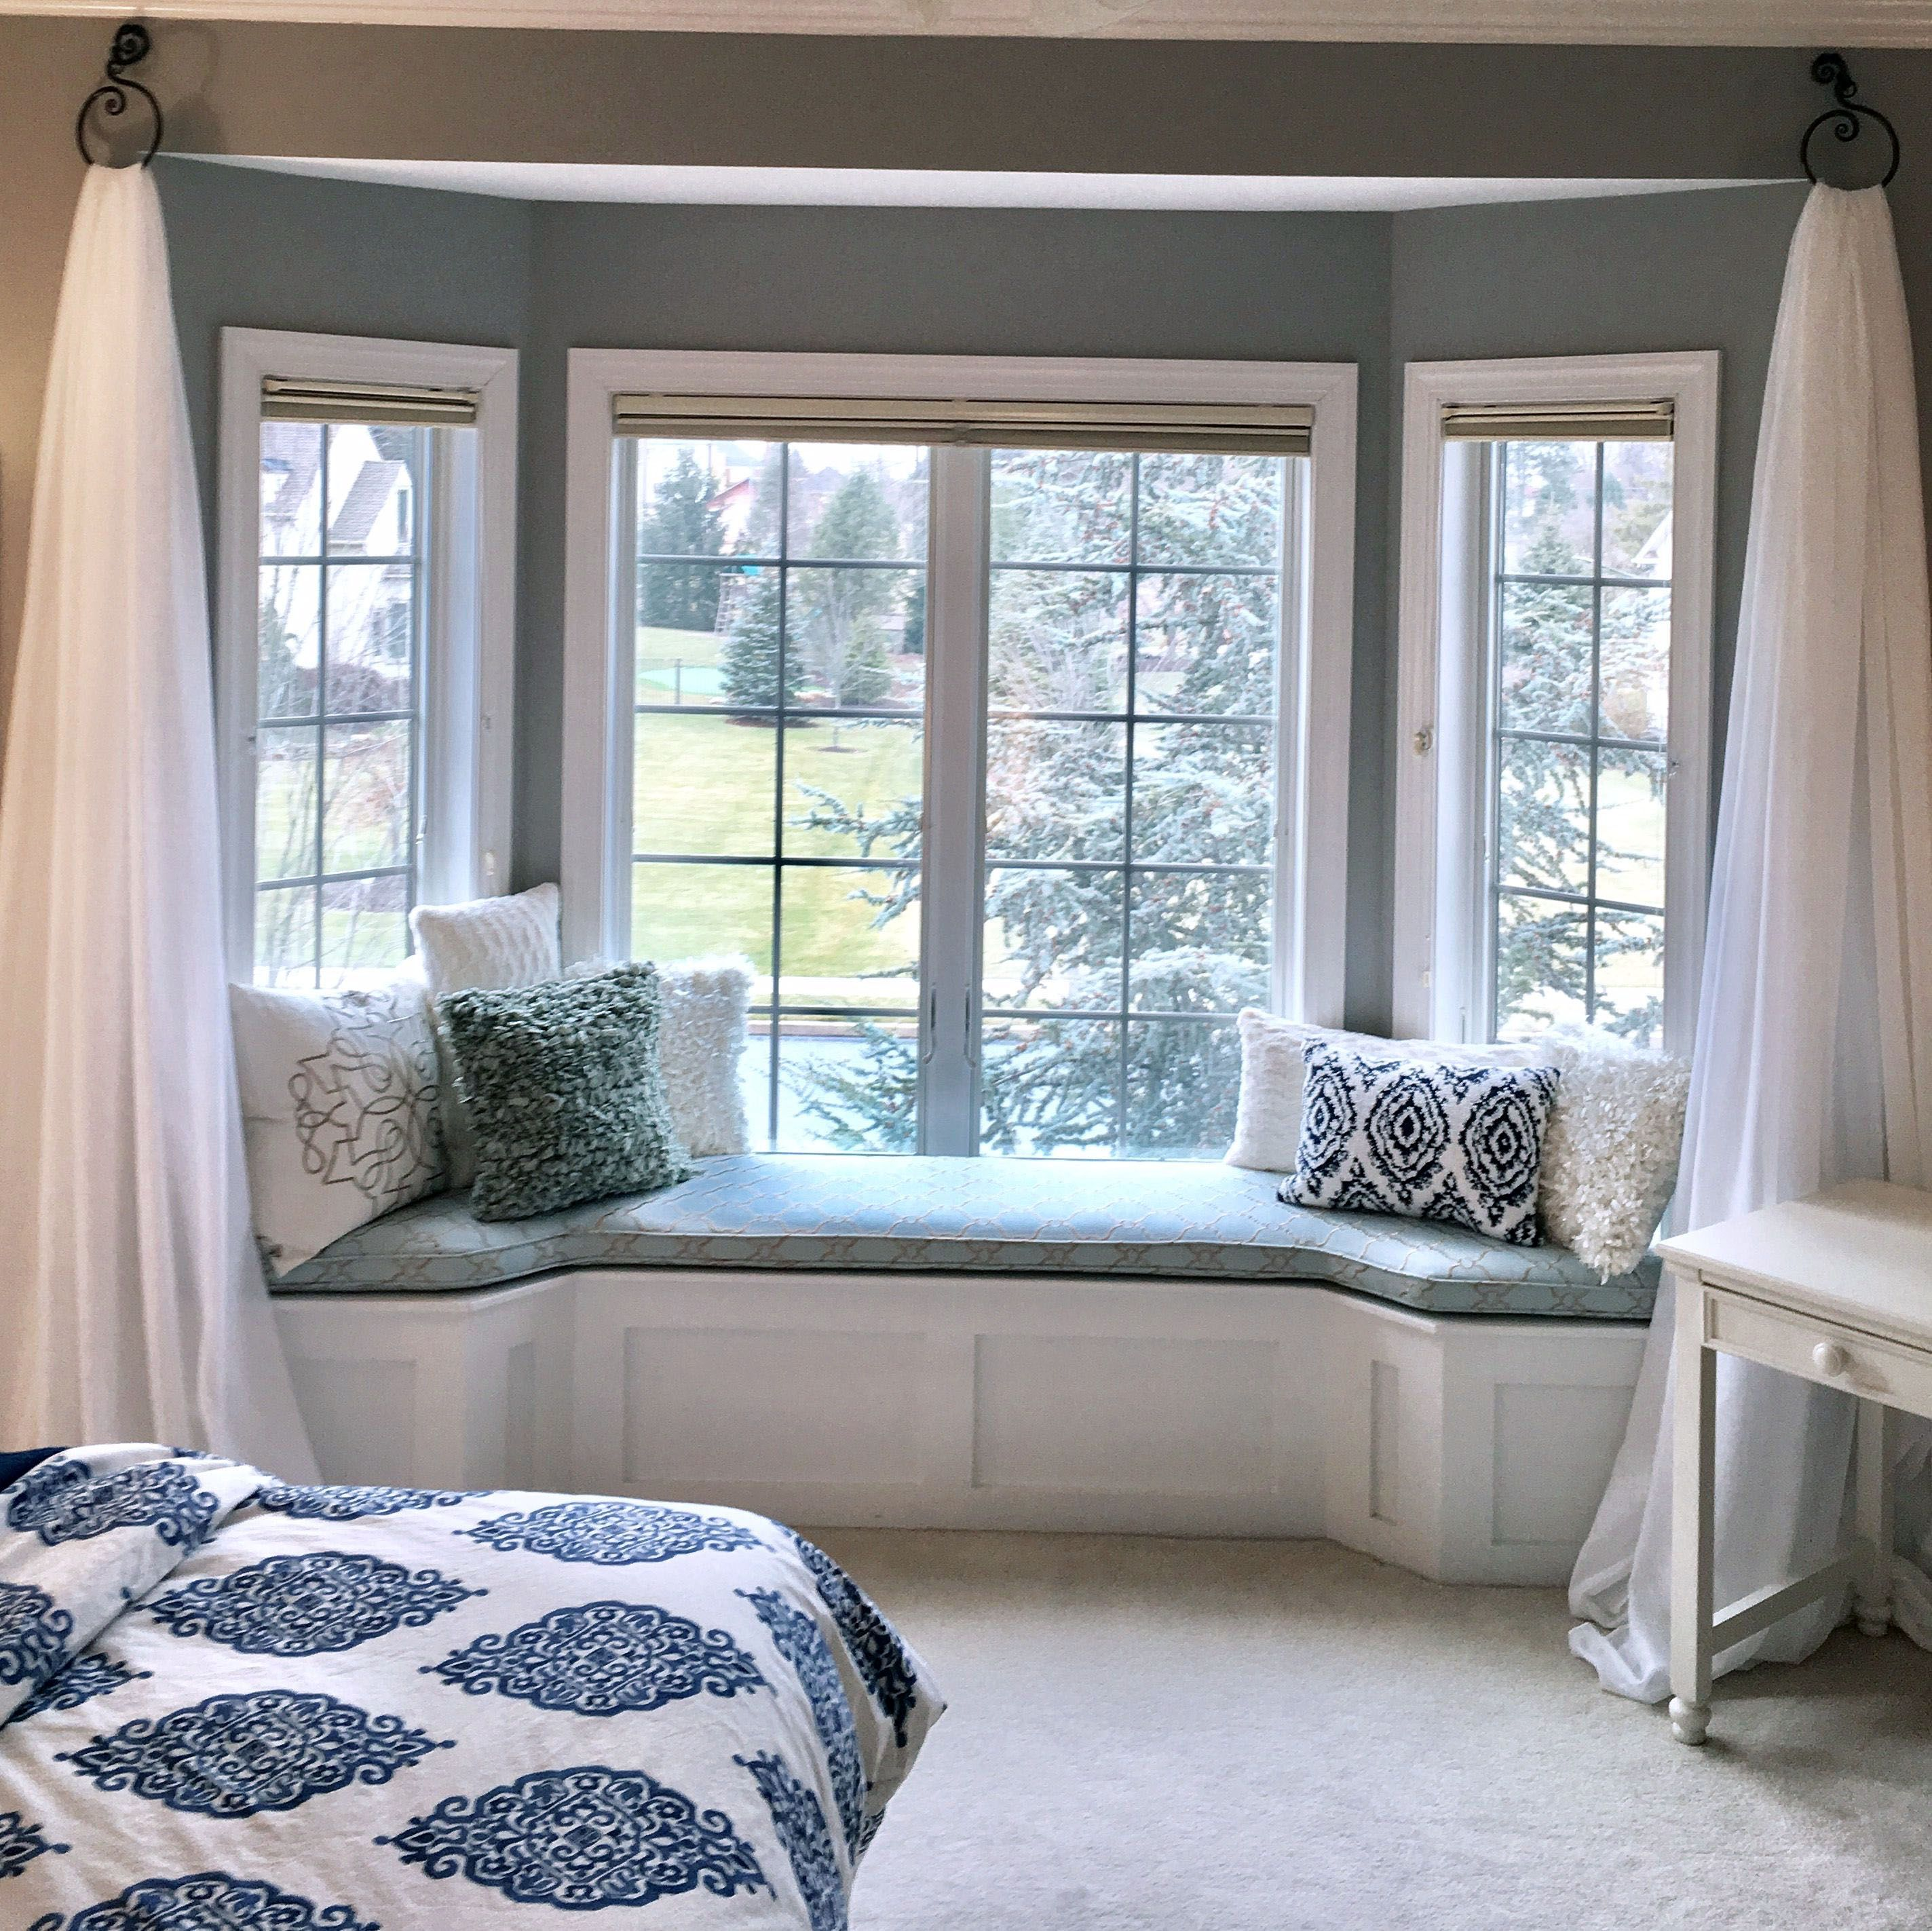 Imaginative Ways To Use Window Seats Bedroom Window Seat Window